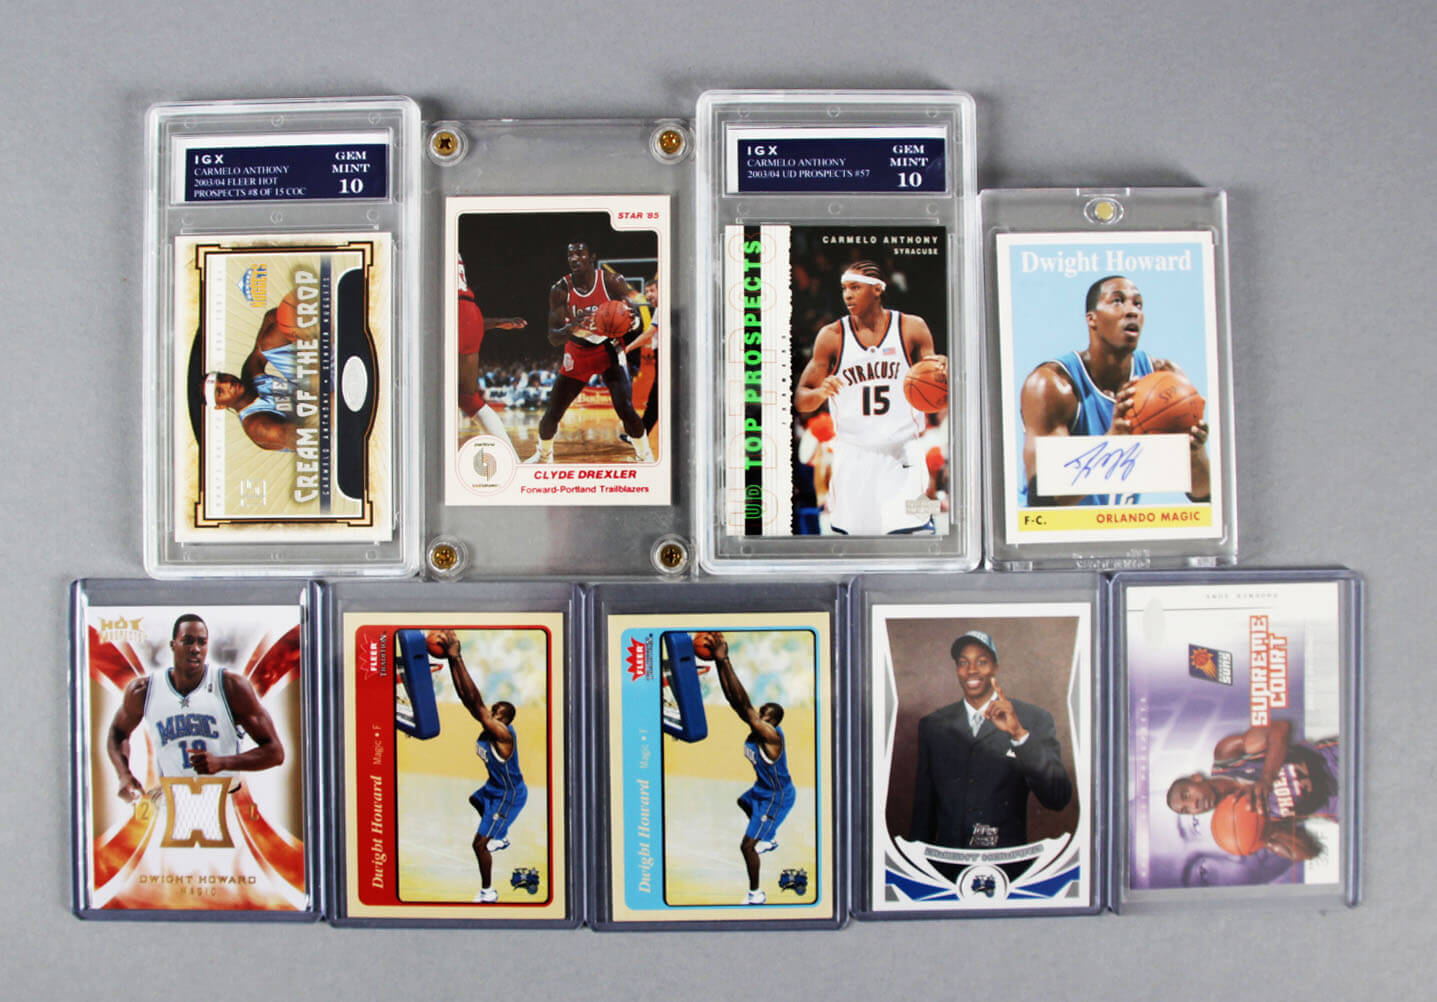 NBA Basketball Rookies & Inserts Card Lot (9) Incl. Dwight Howard Auto etc.